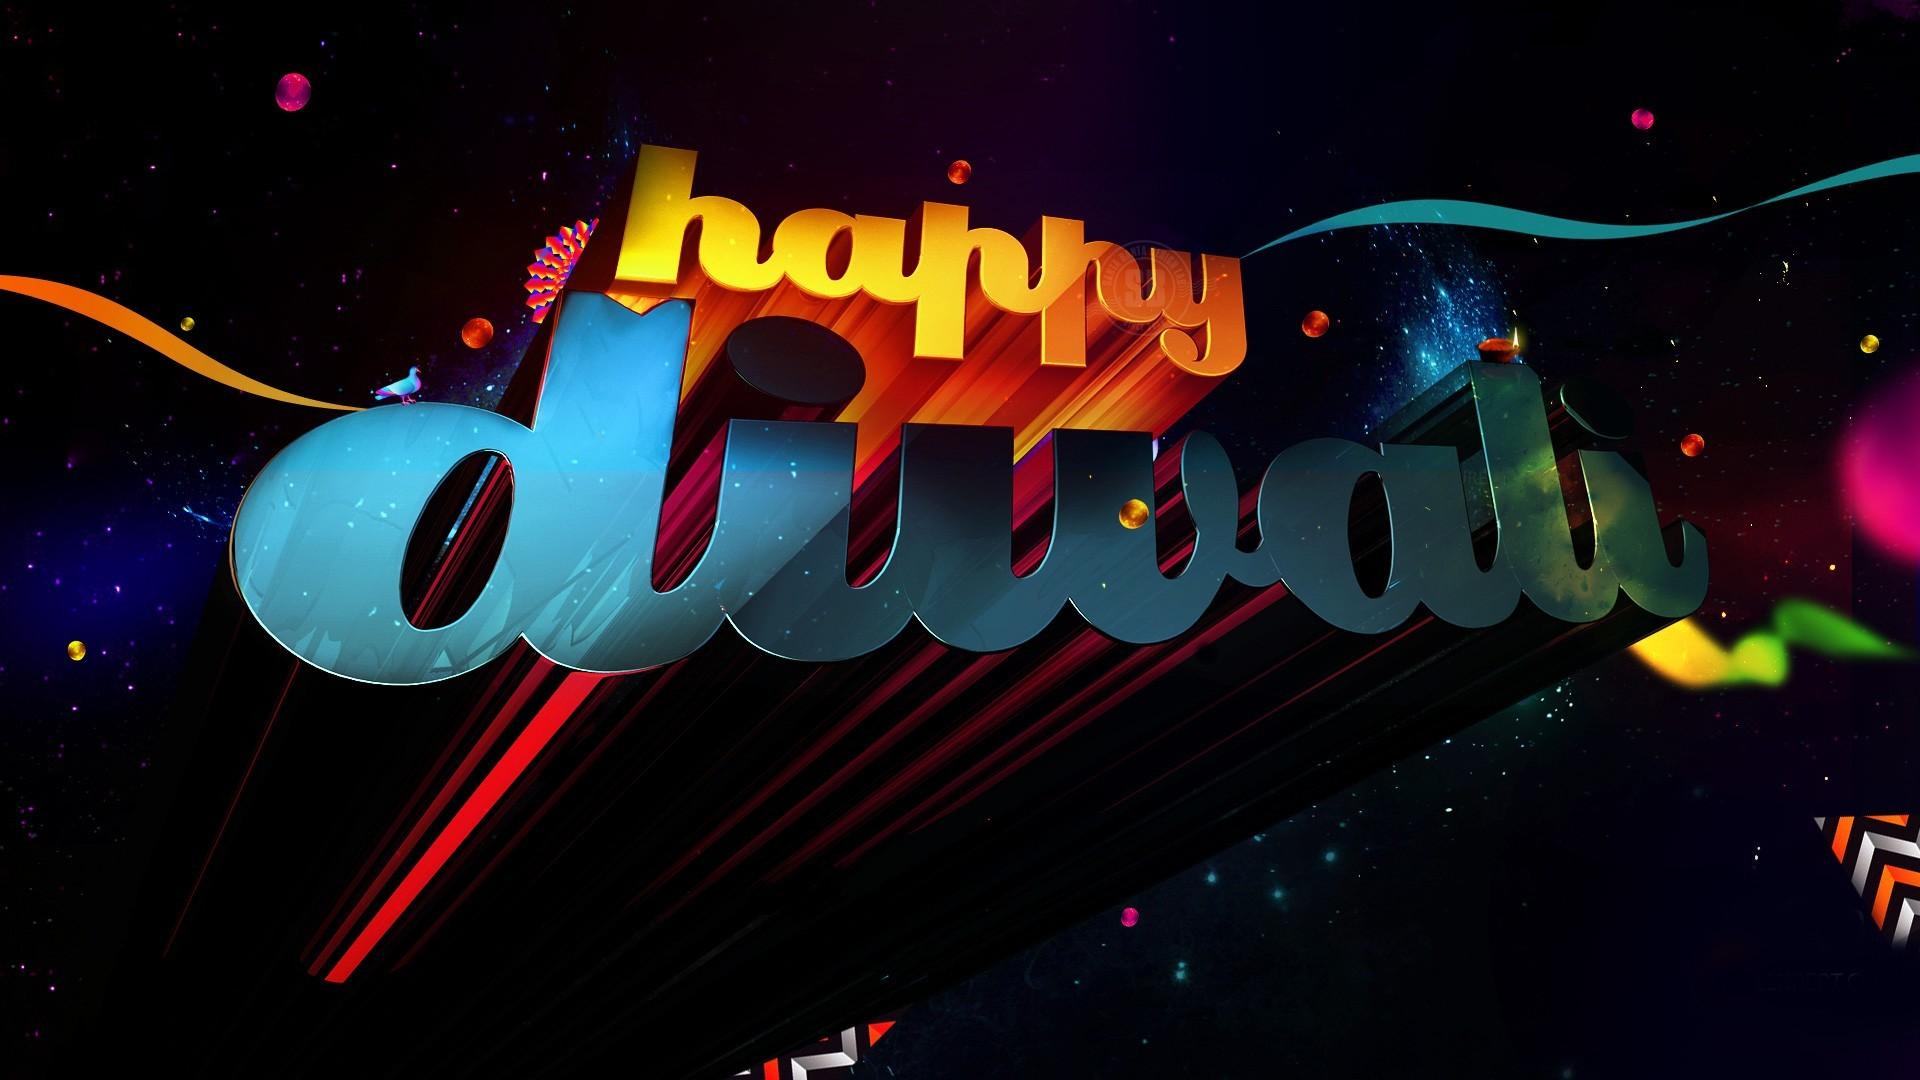 Hd Diwali Wallpapers Free Happy Diwali Images 2017 Diwali Wallpapers Hd Free